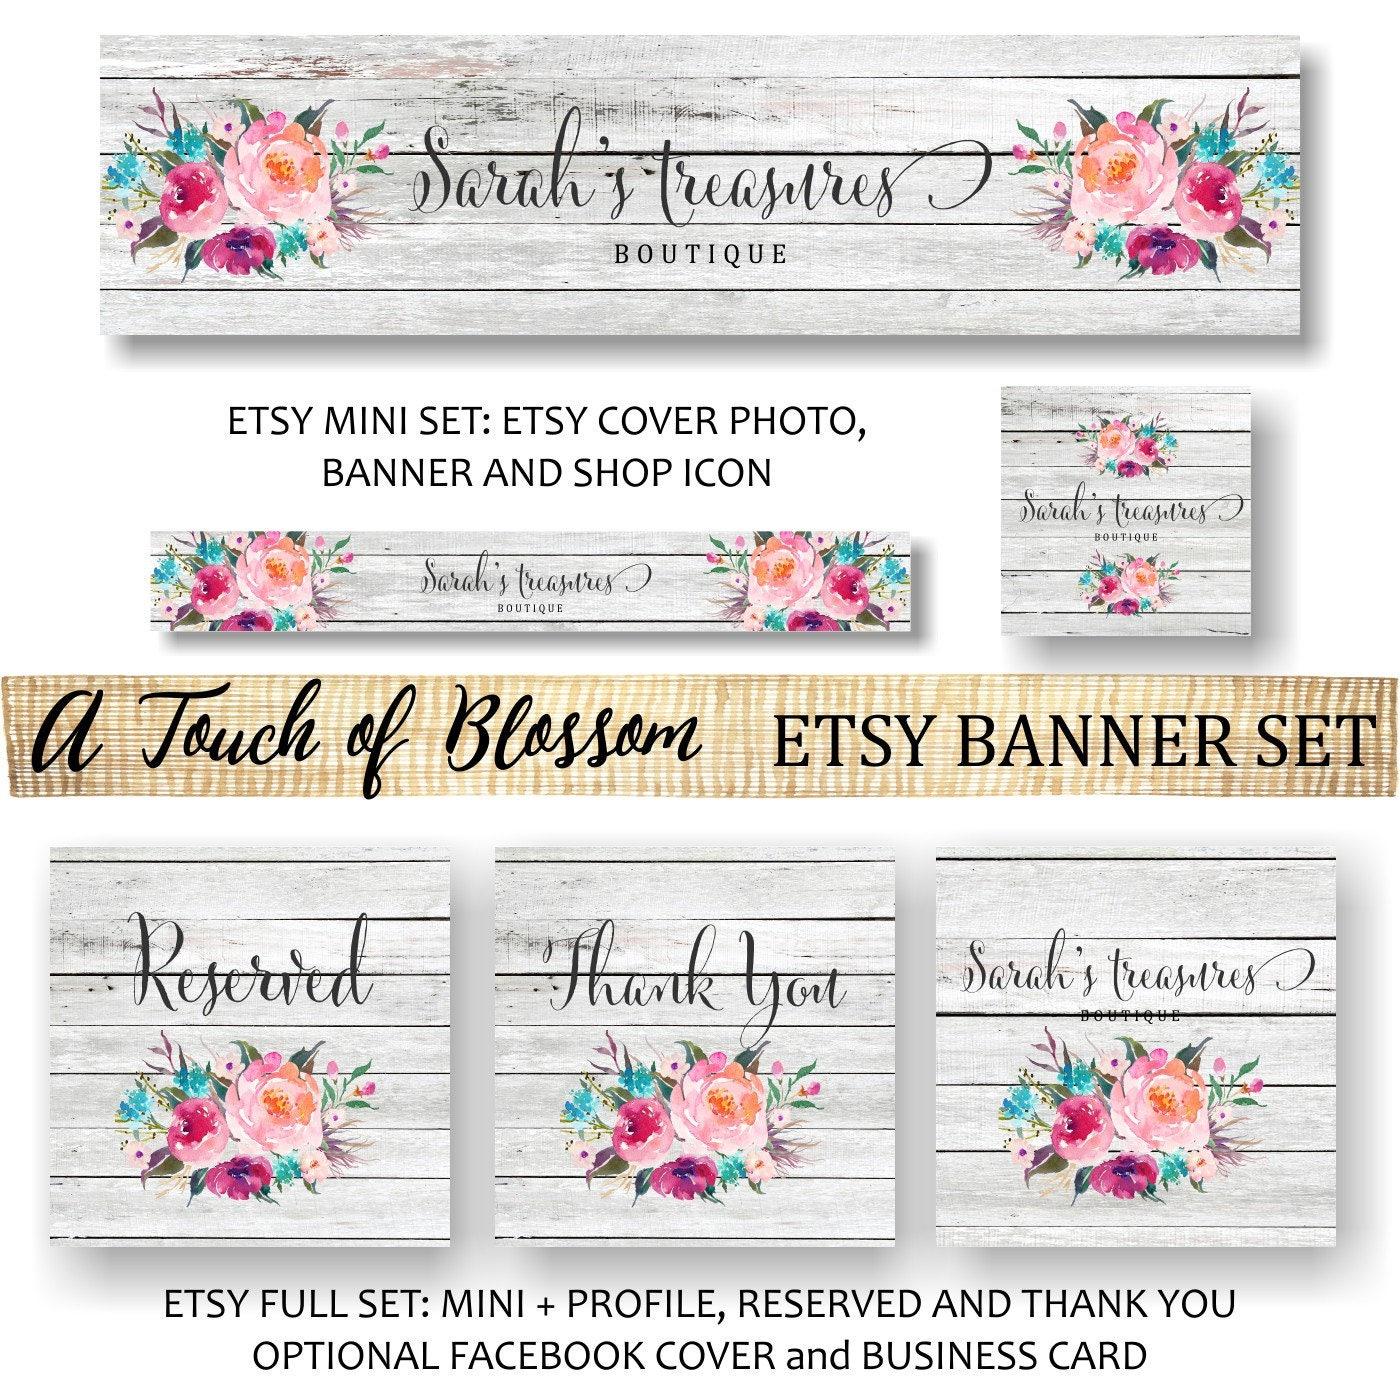 Etsy Banner Rustic Floral Flowers Peonies Wooden Pink Watercolor Facebook Business Card Website Shop